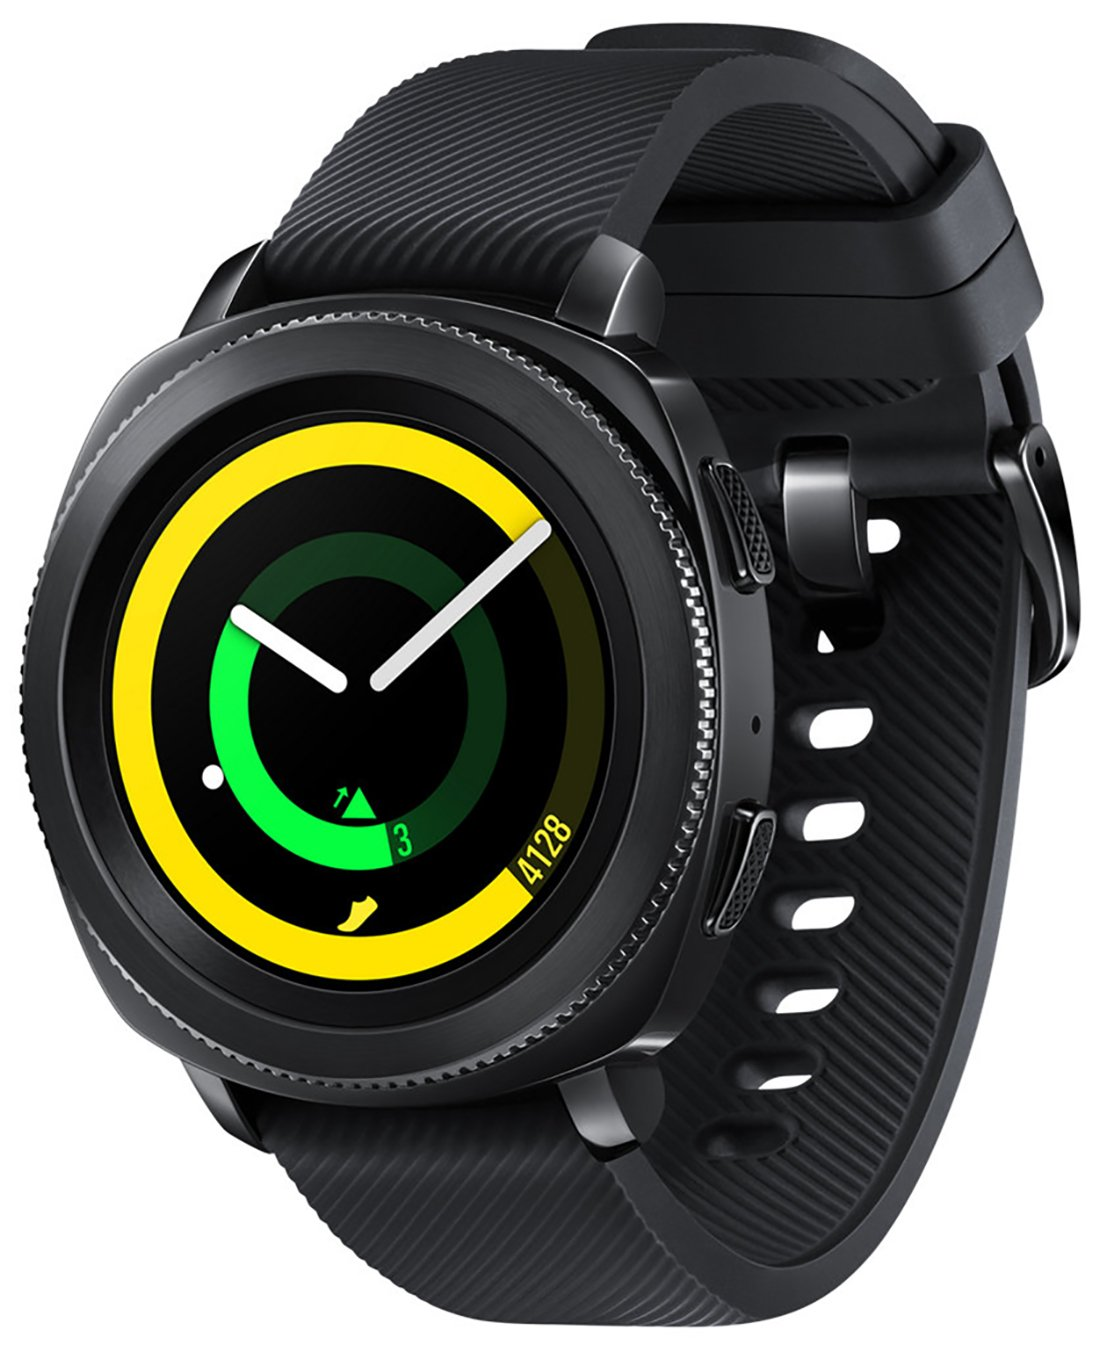 Samsung Gear Sport Smartwatch Fitness Tracker- Water Resistant - International Version- No Warranty- Black (SM-R600NZKATTT) by Samsung (Image #2)